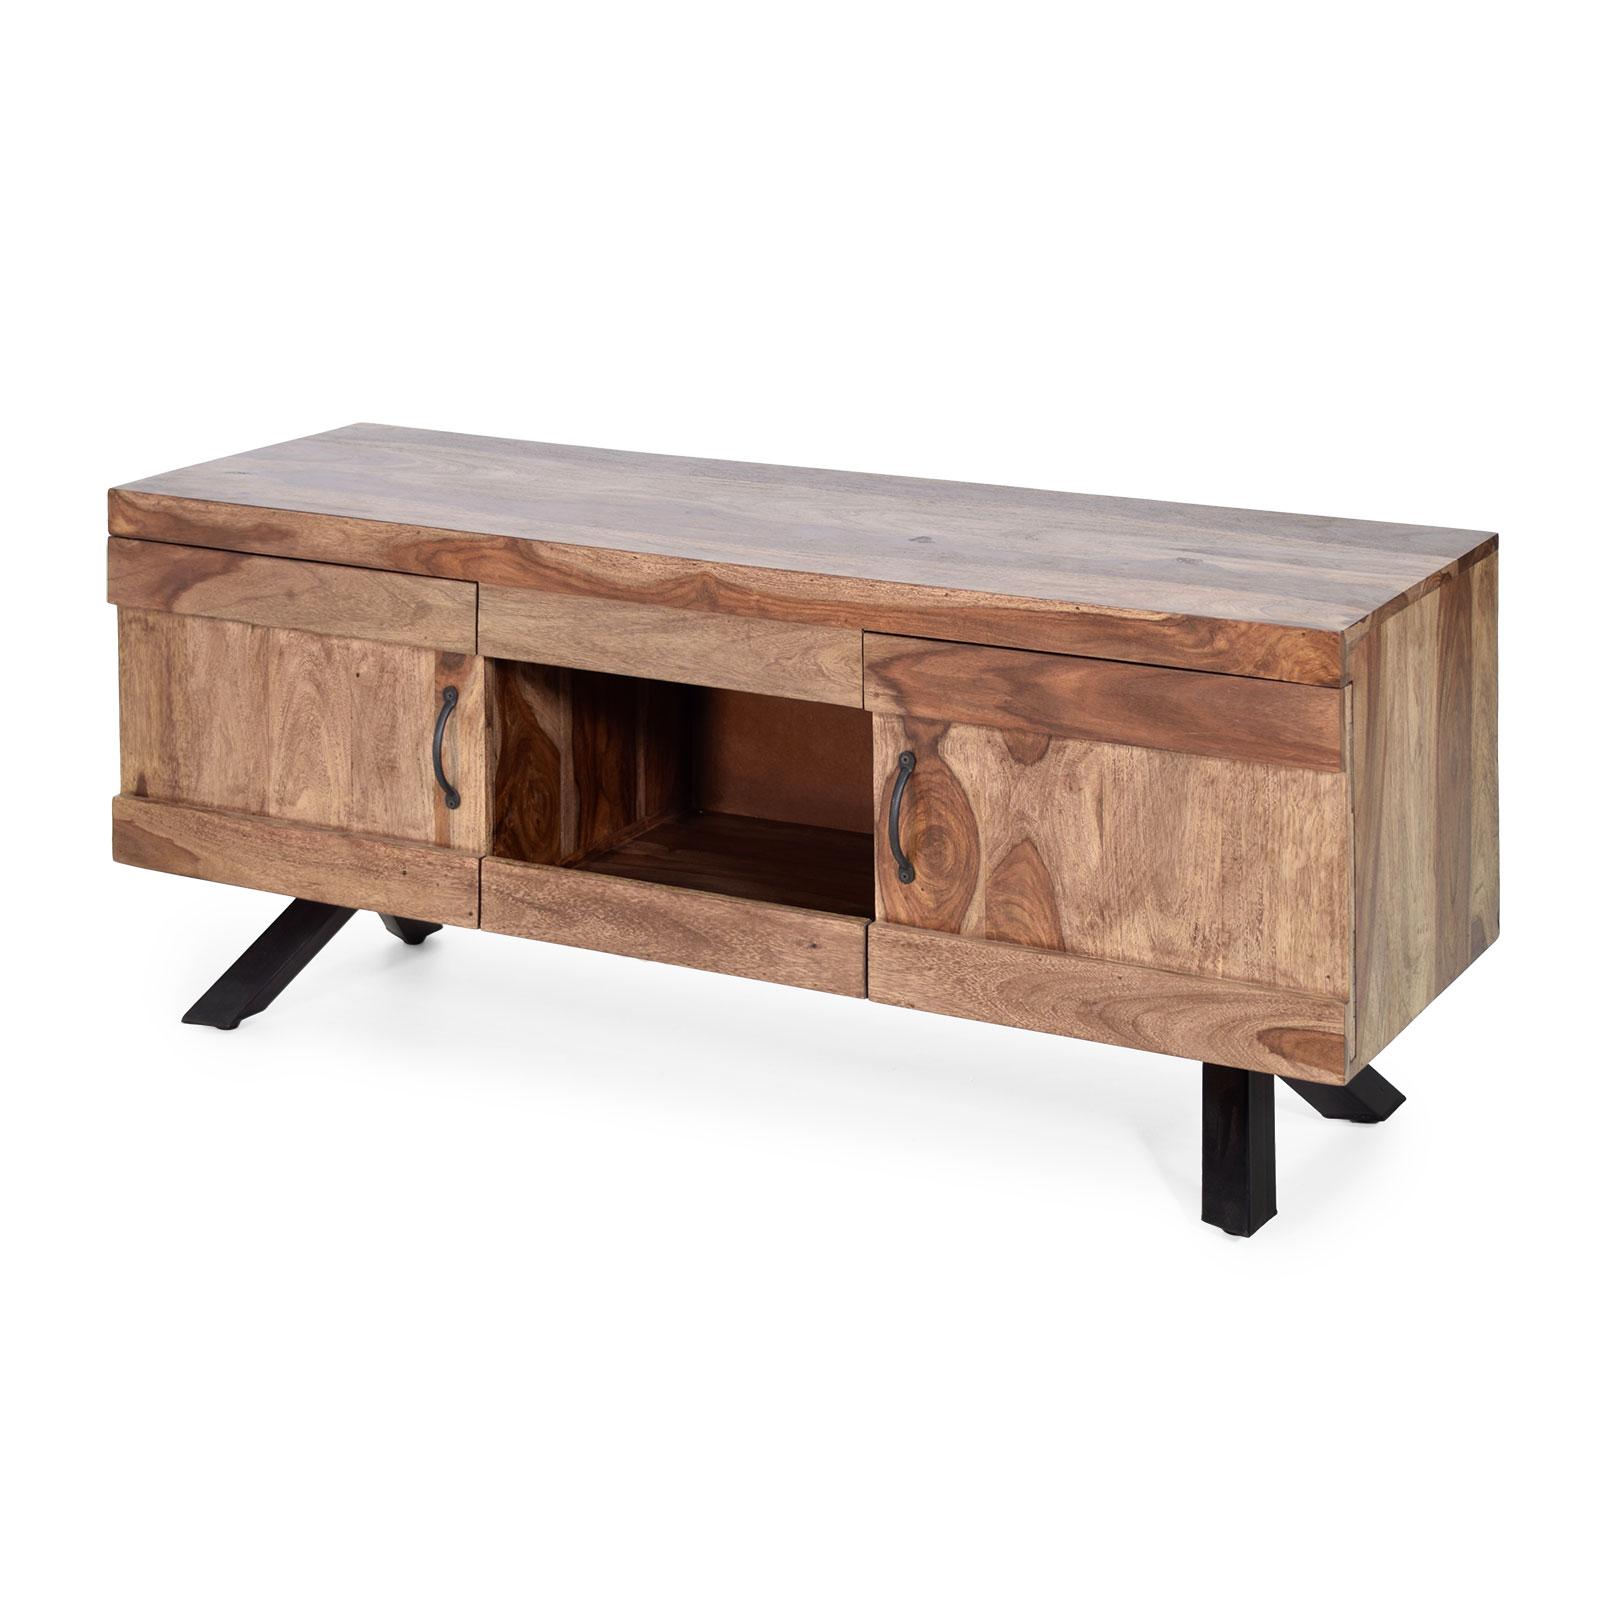 Lowboard 135 x 43 x 58 cm Sheesham Massivholz